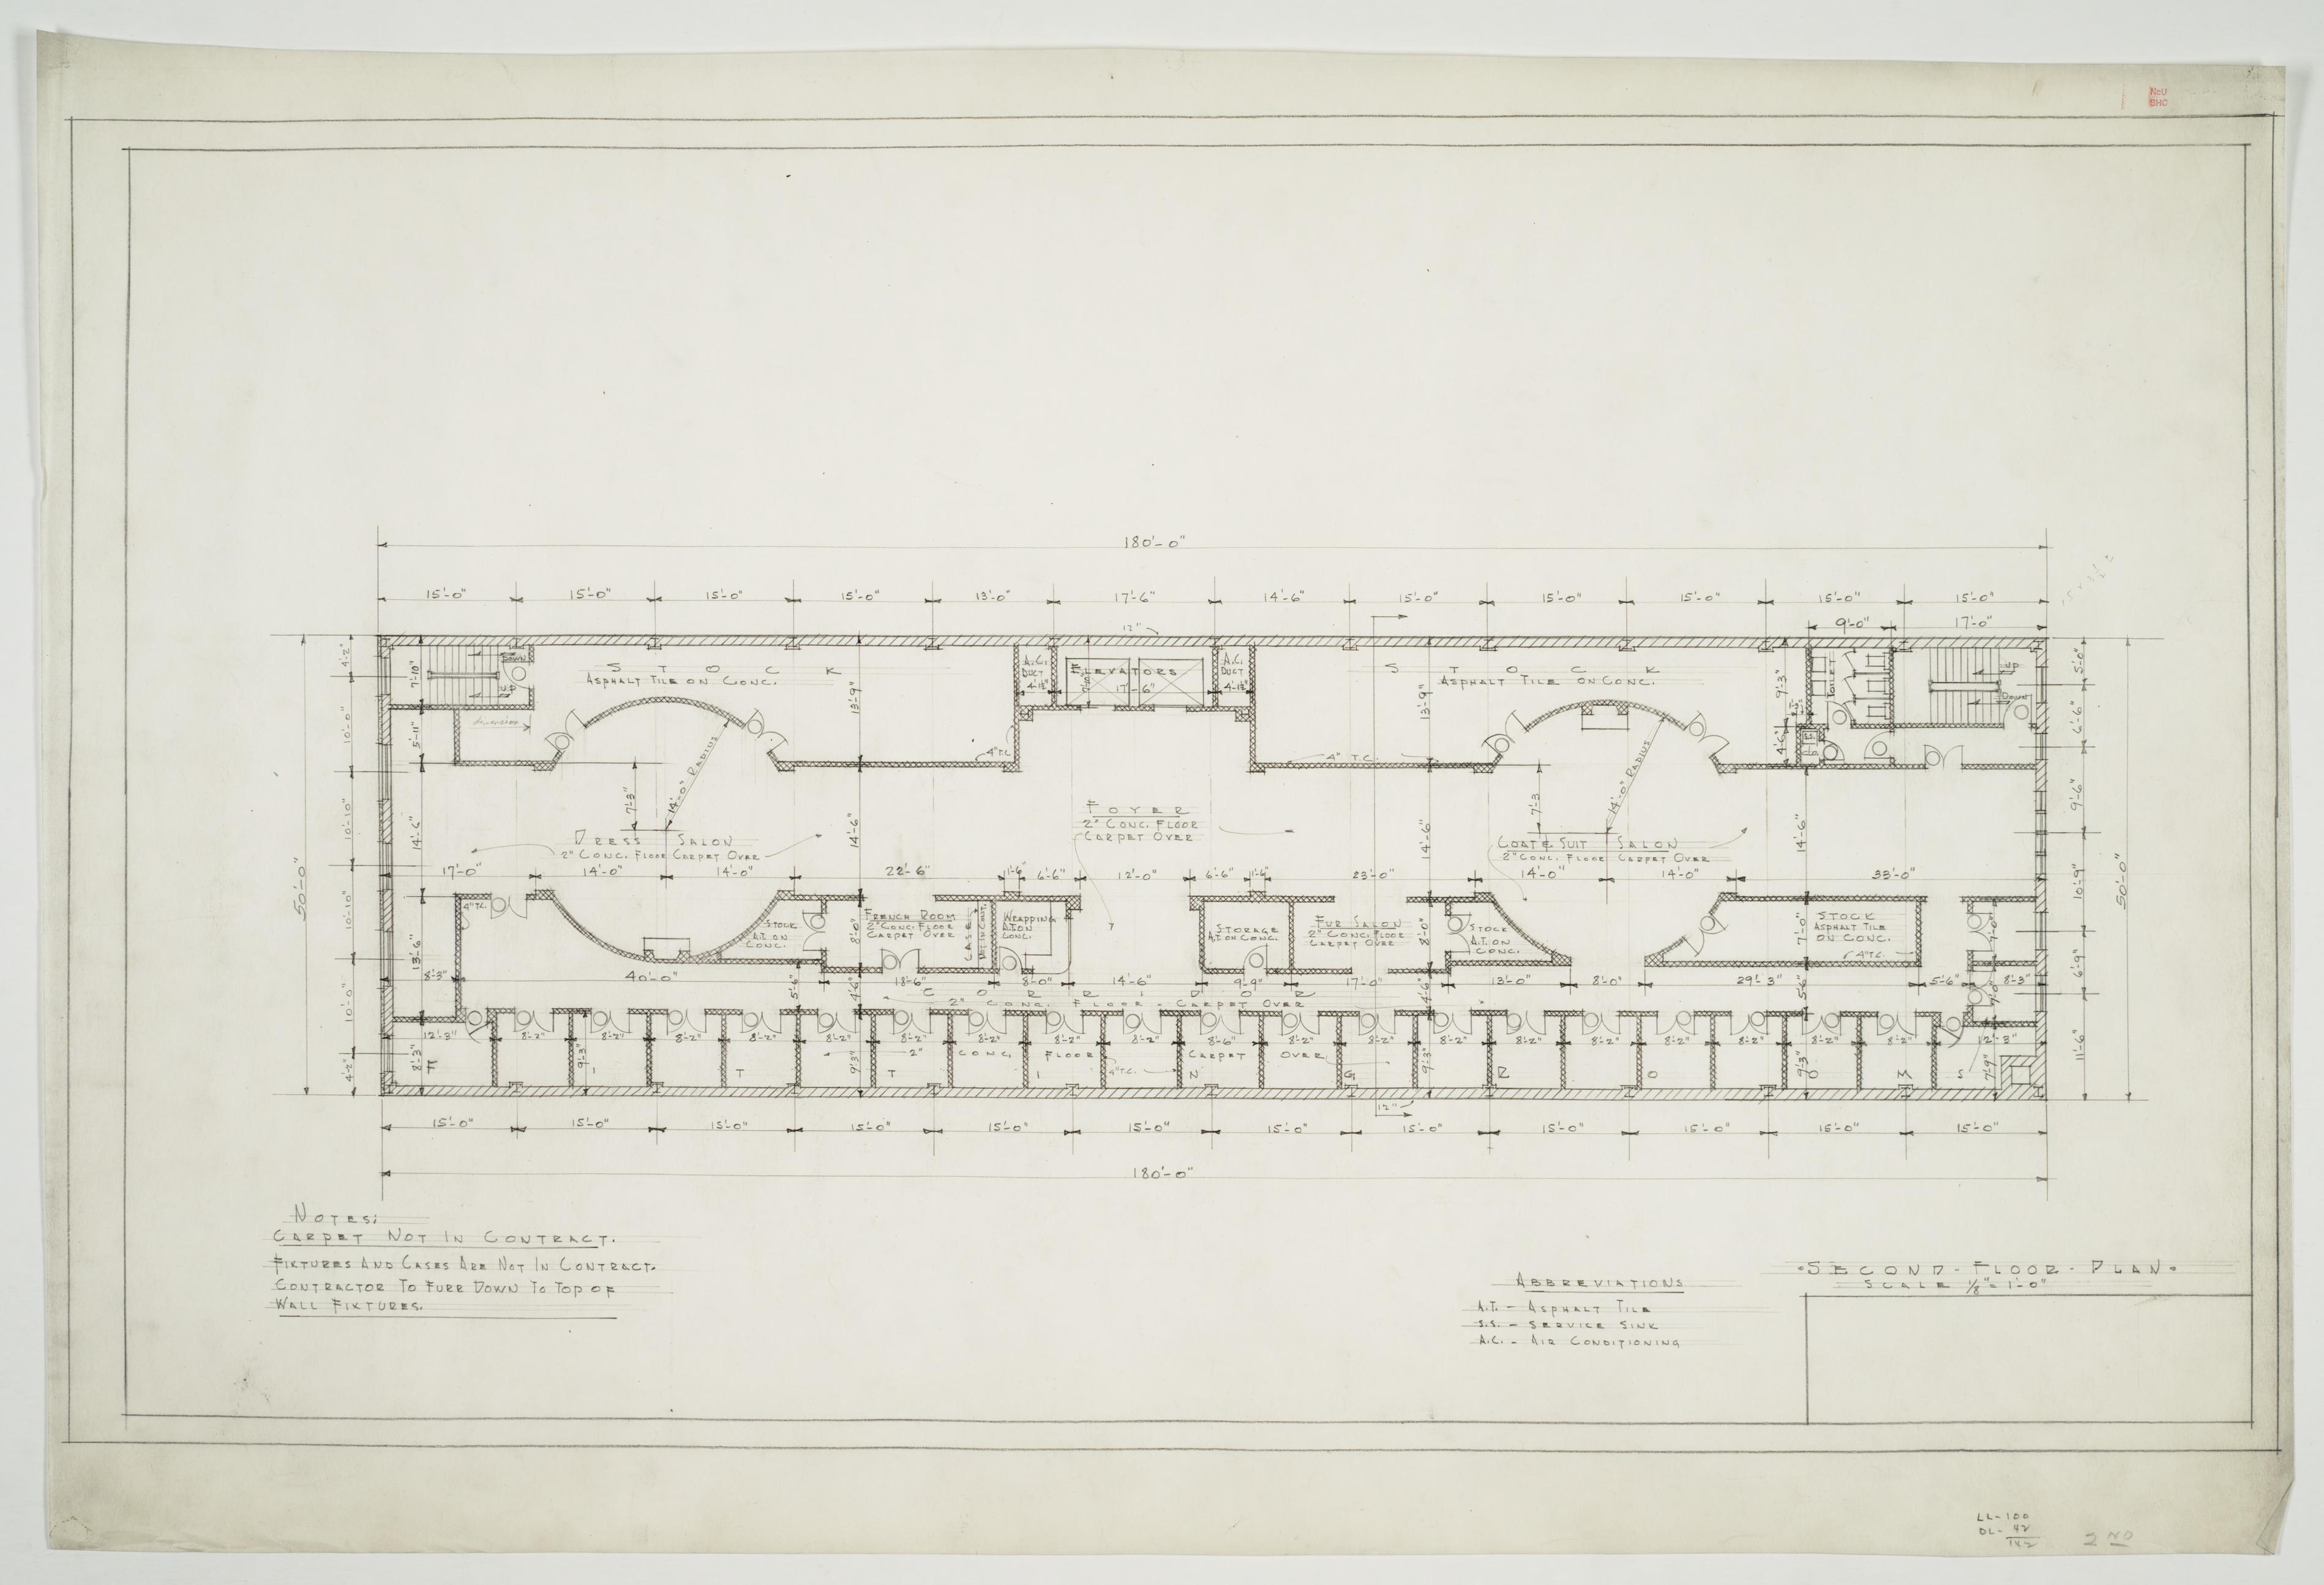 Second Floor Plan (Montaldo's Department Store (Charlotte